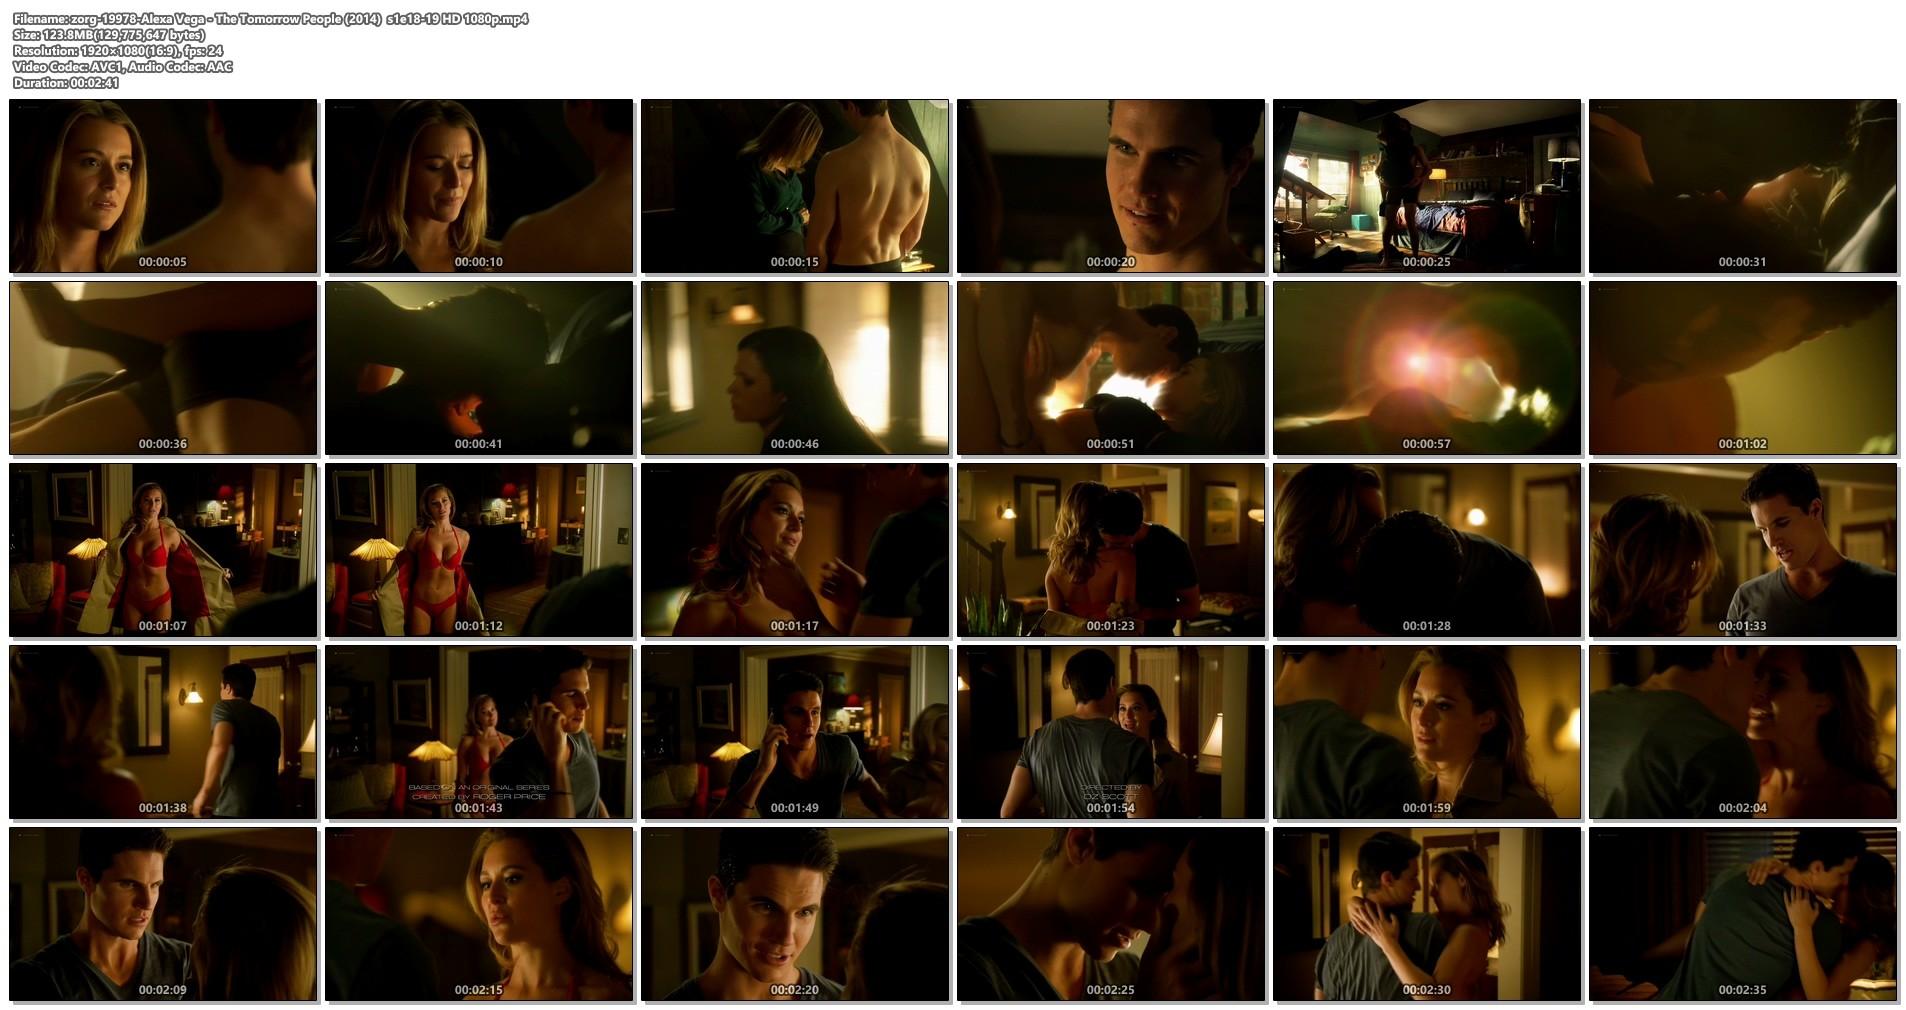 Alexa Vega hot and some sex - The Tomorrow People (2014) s1e18-19 HD (1)